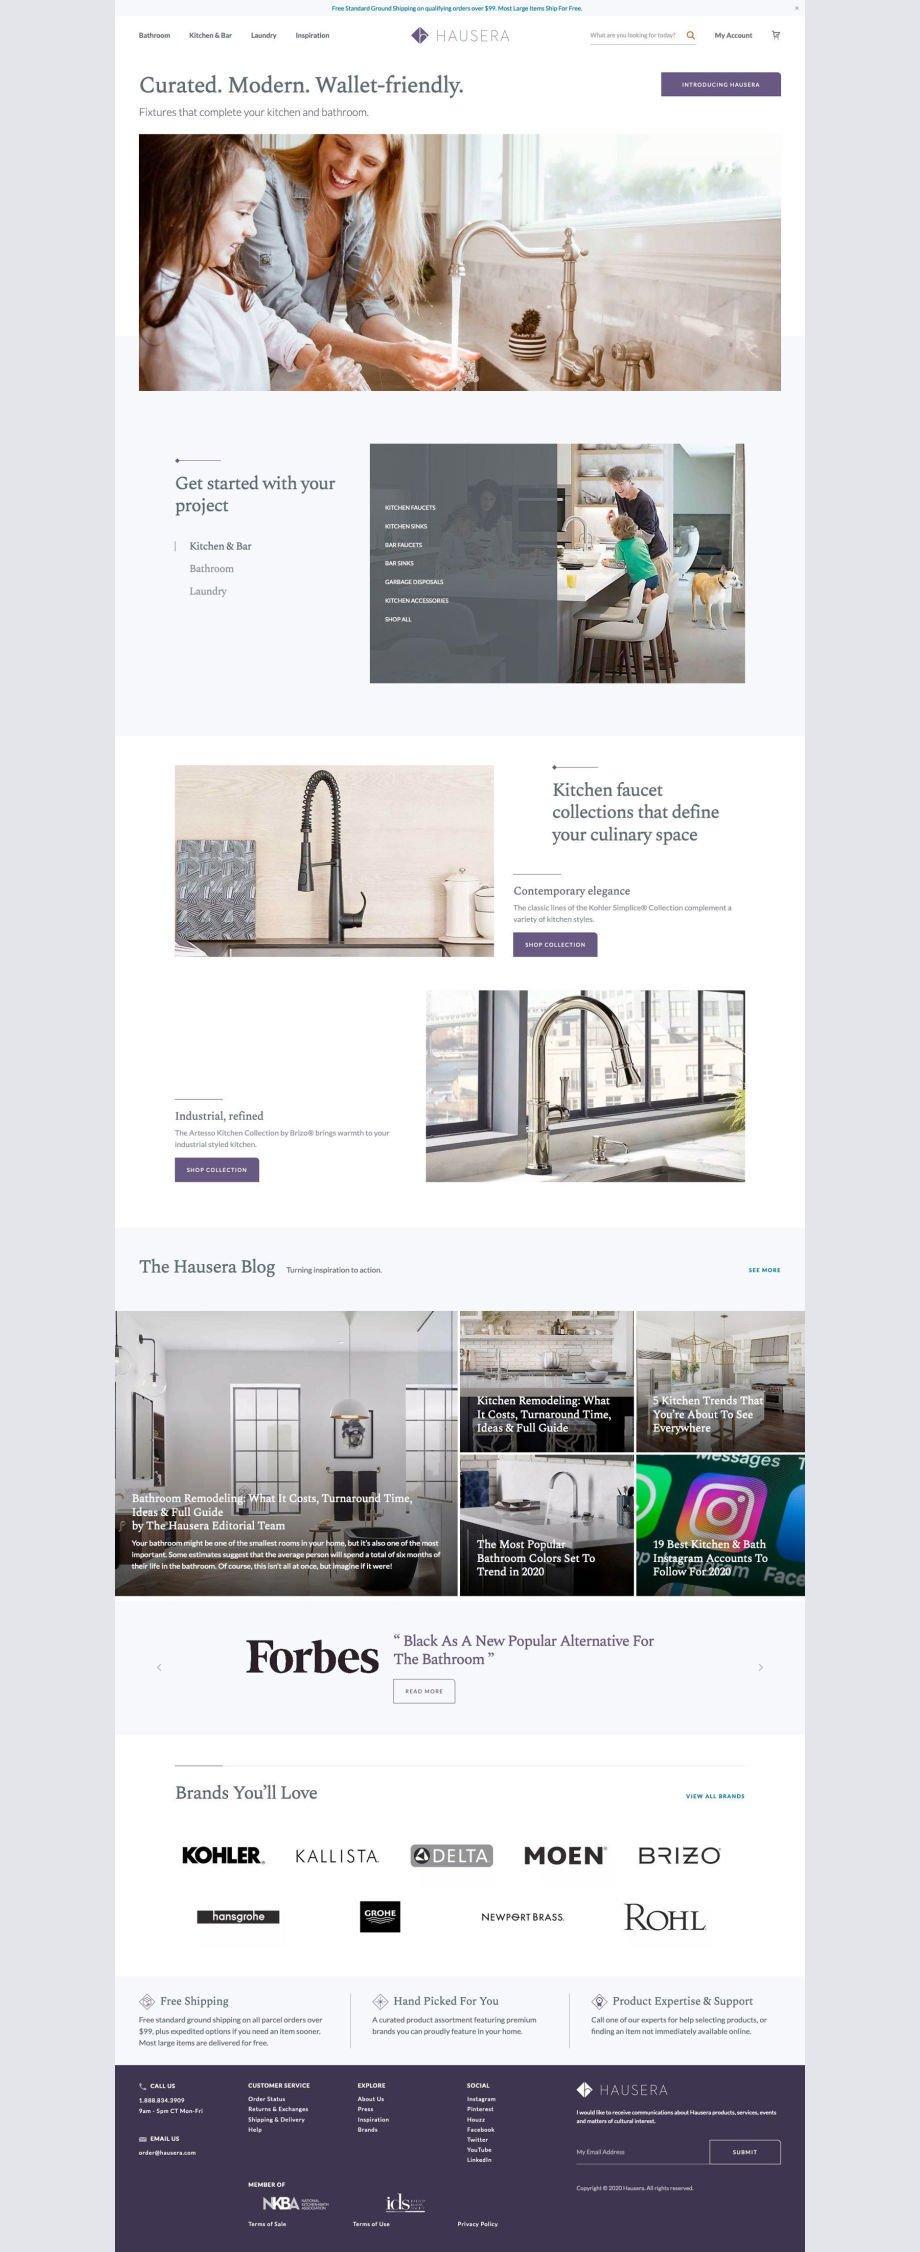 Hausera website.jpg